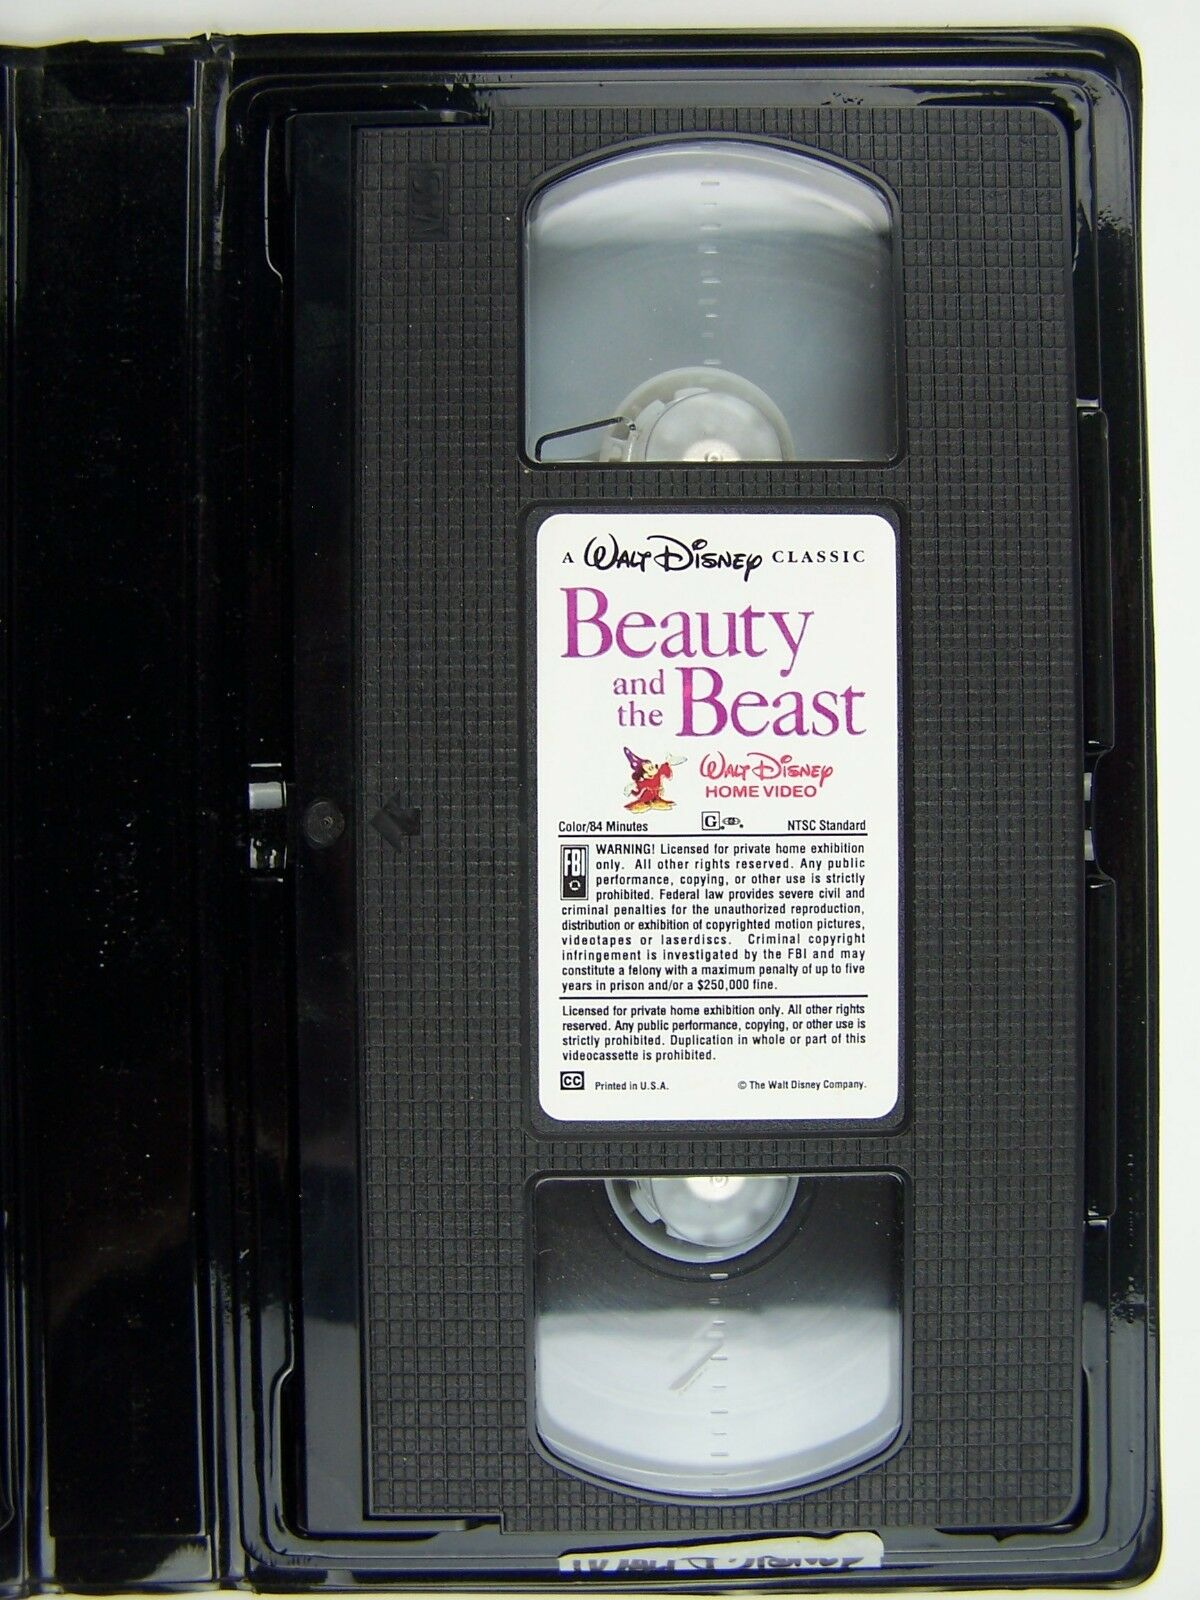 Walt Disney Classic Beauty and the Beast Black Diamond